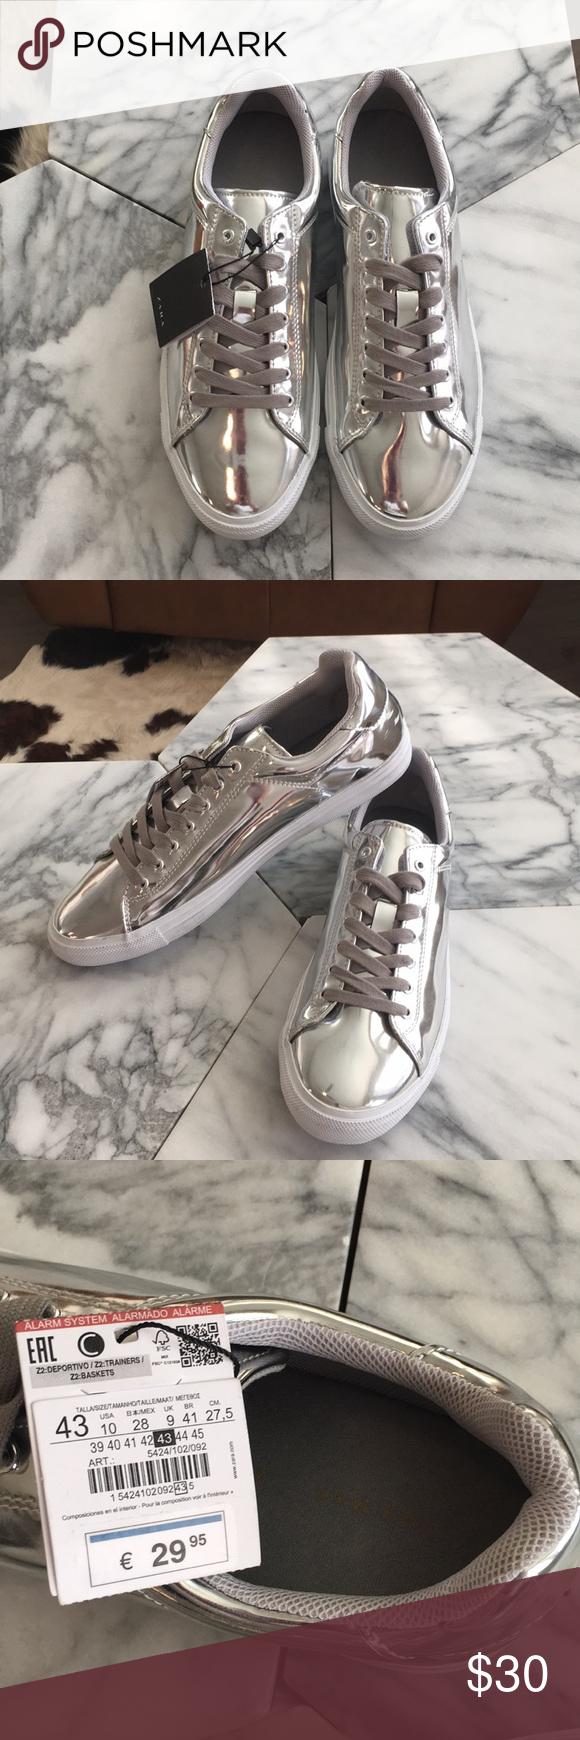 Zara Man Metallic Silver Trainers